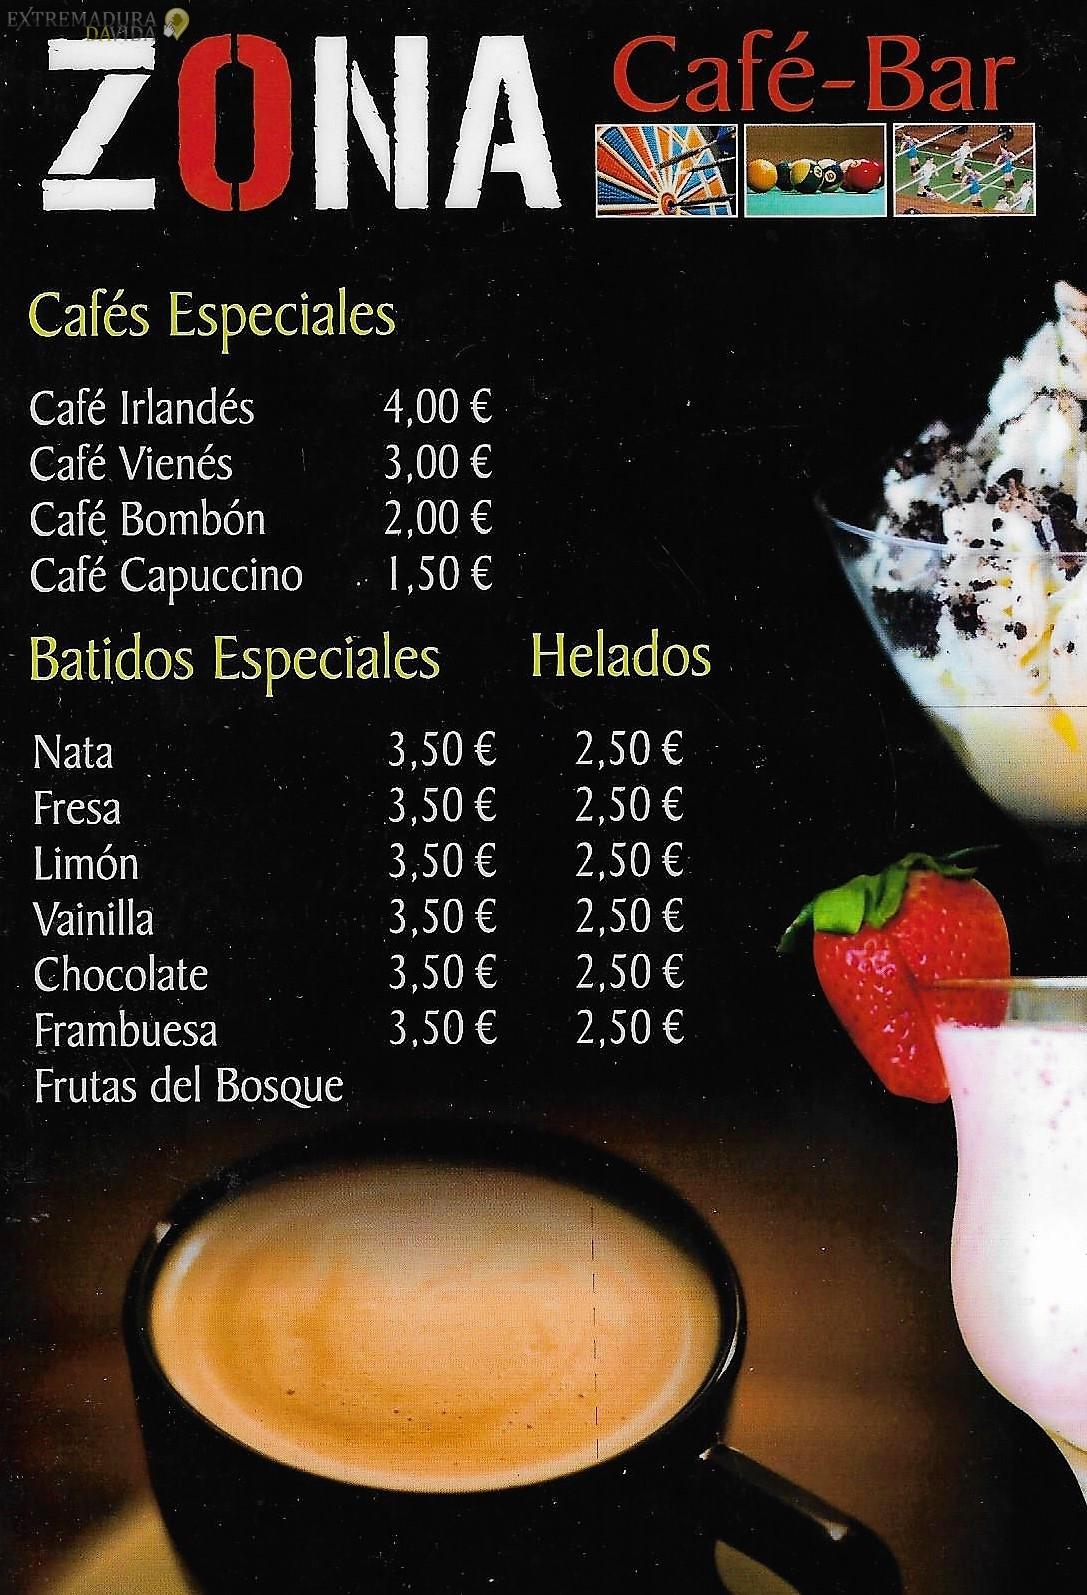 Cáceres Billares Zona Pub